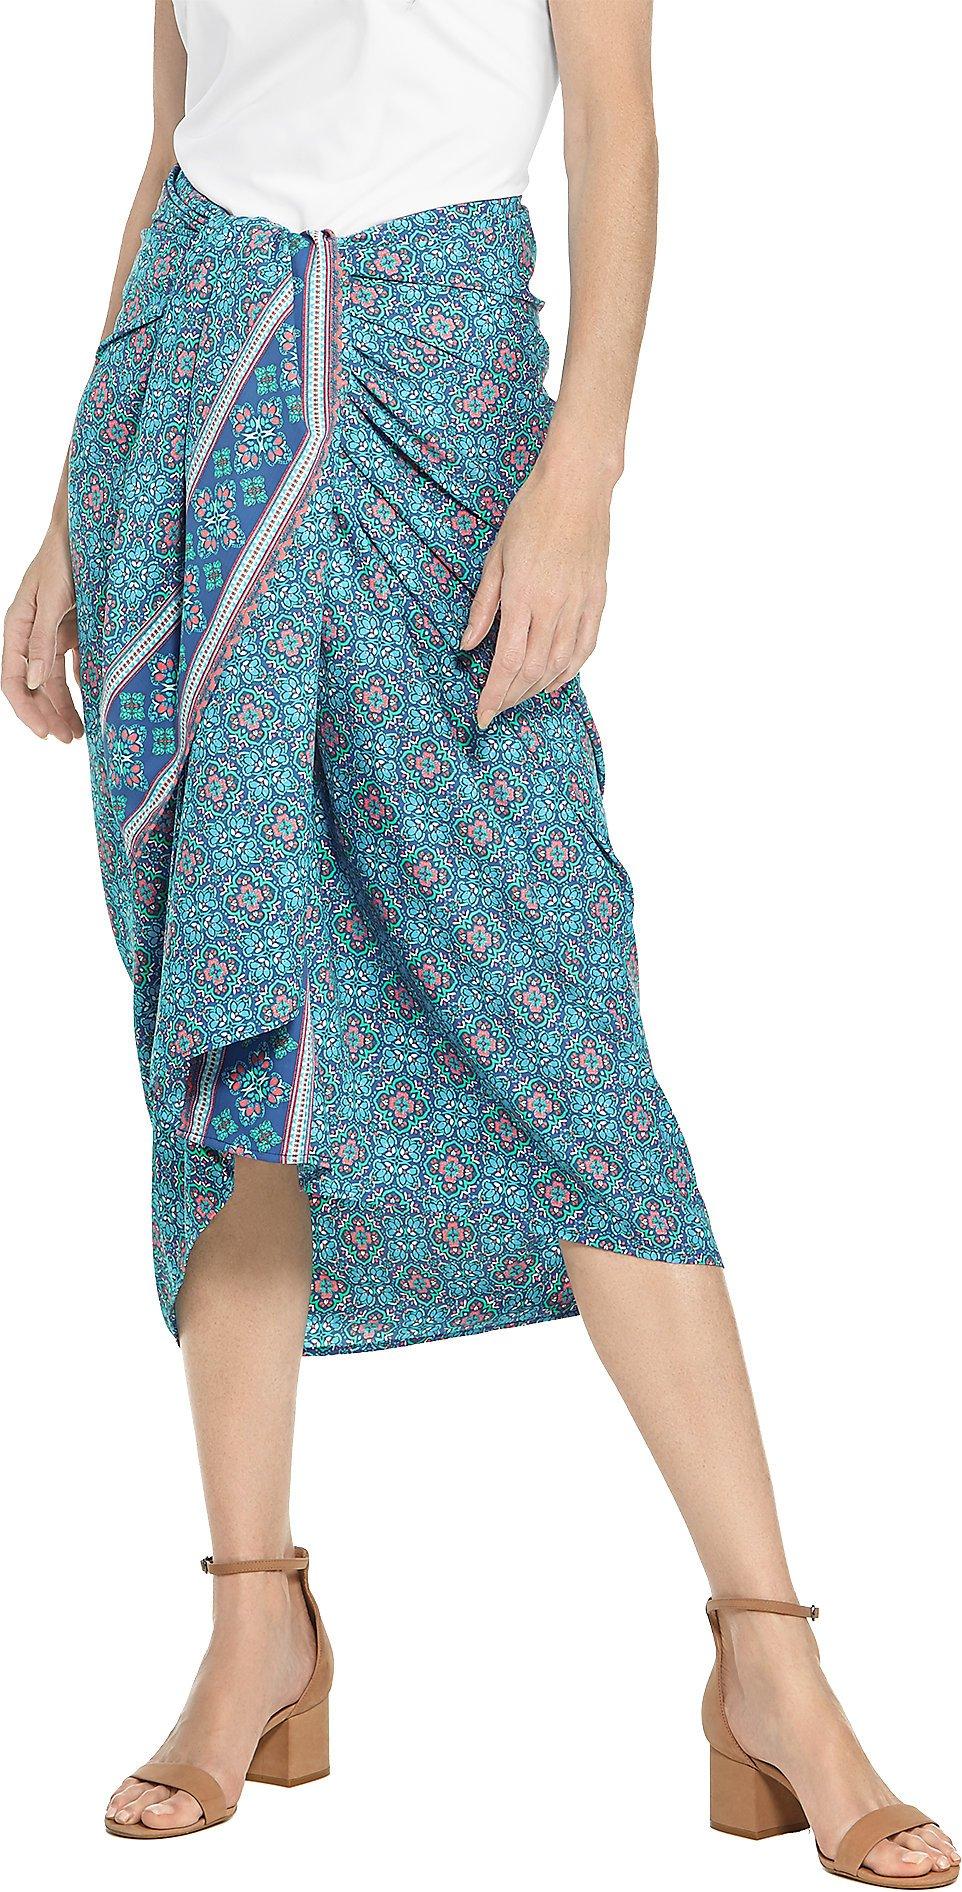 Coolibar UPF 50+ Women's Pareo - Sun Protective (Small/Medium- Blue Spanish Mosaic)